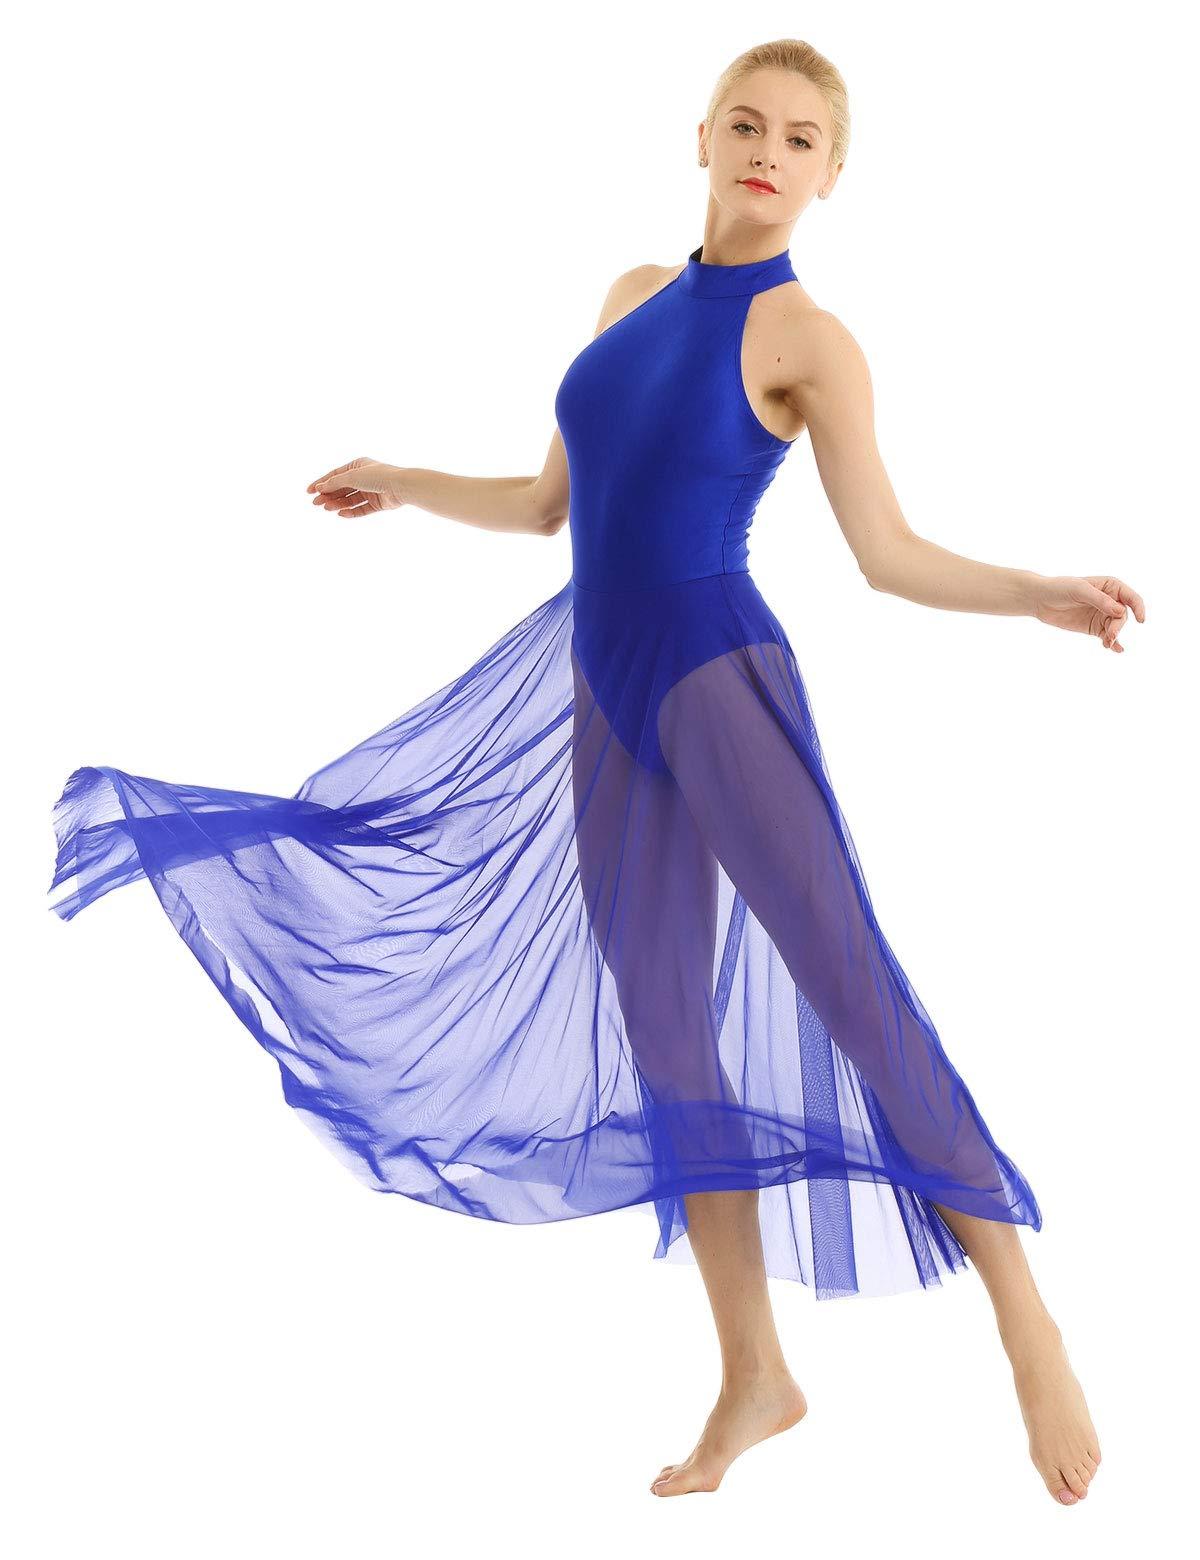 Yeahdor Womens Lyrical Ballet Dance Dress Modern Asymmetric Chiffon High-Low Midi Skirt Sweetheart Dresses